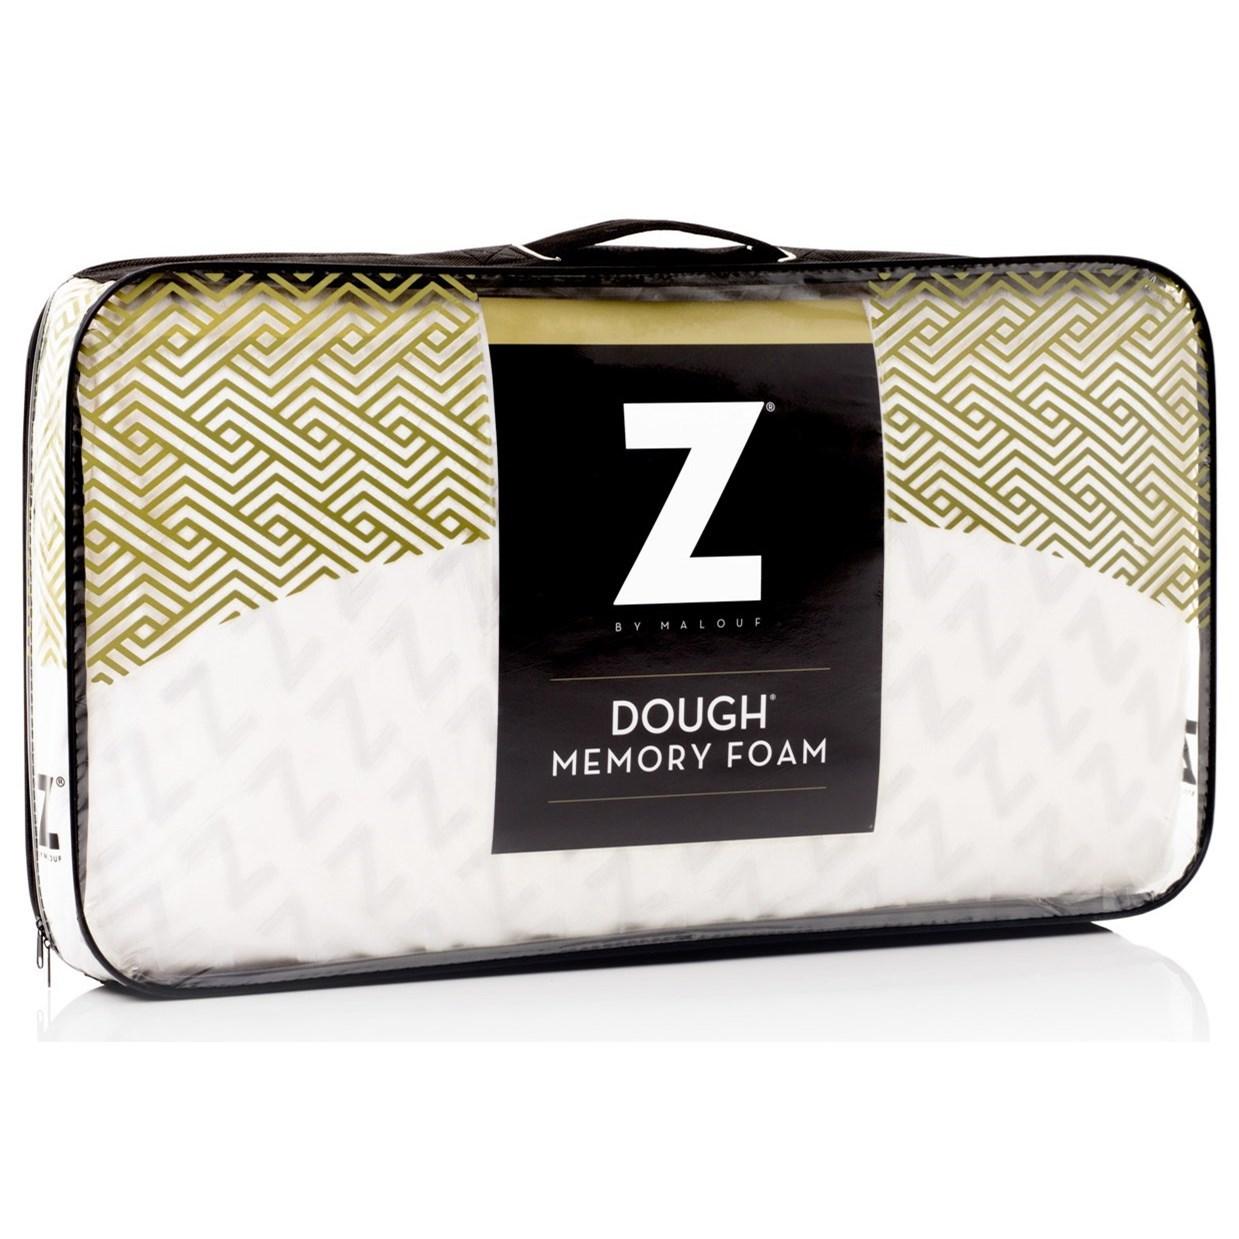 Malouf Dough King Dough High Loft Plush Pillow - Item Number: ZZKKHPDF